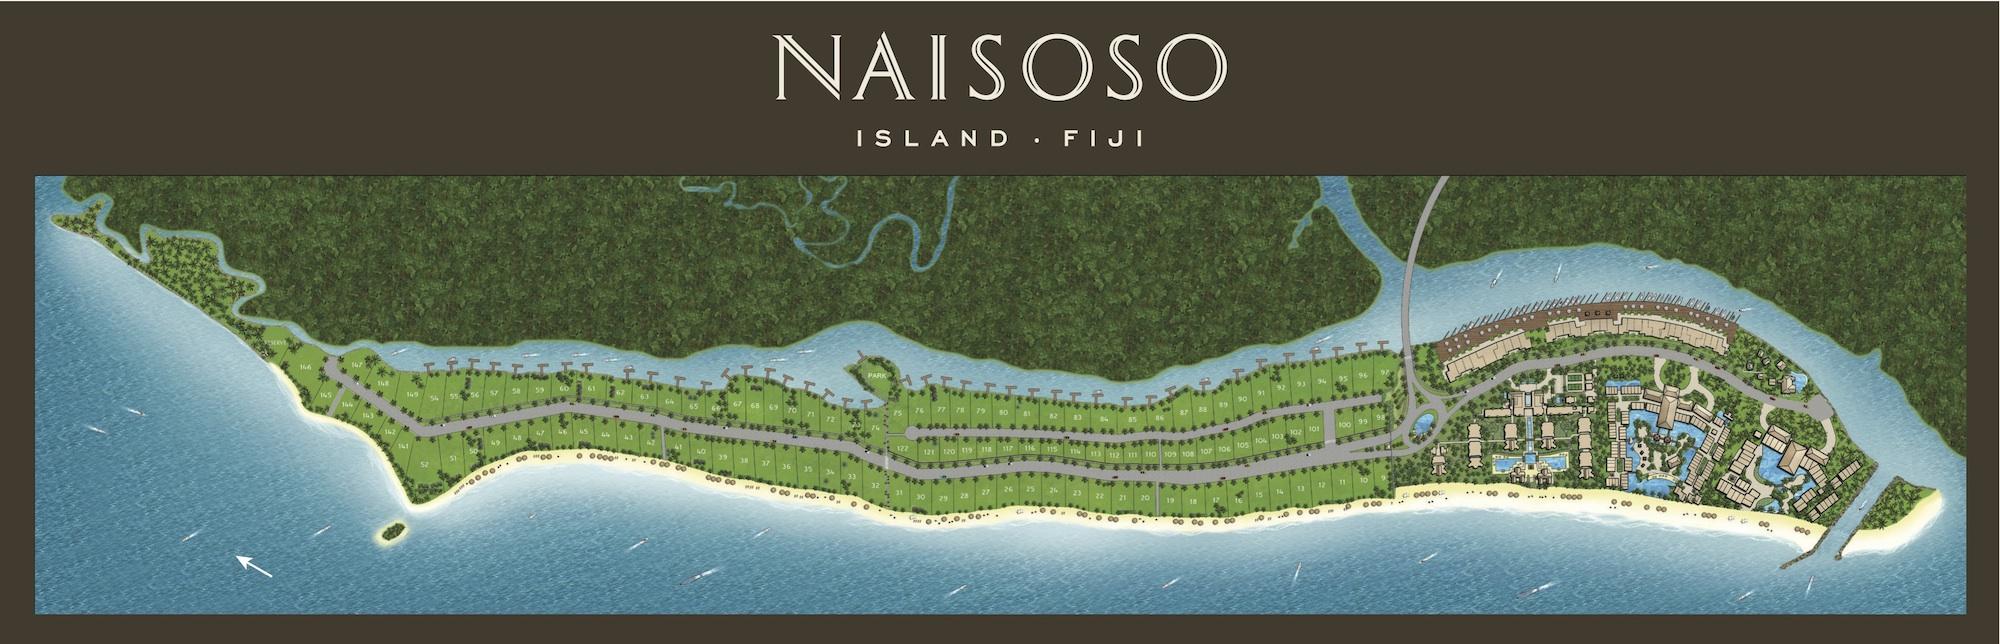 Naisoso Island Villas Fiji